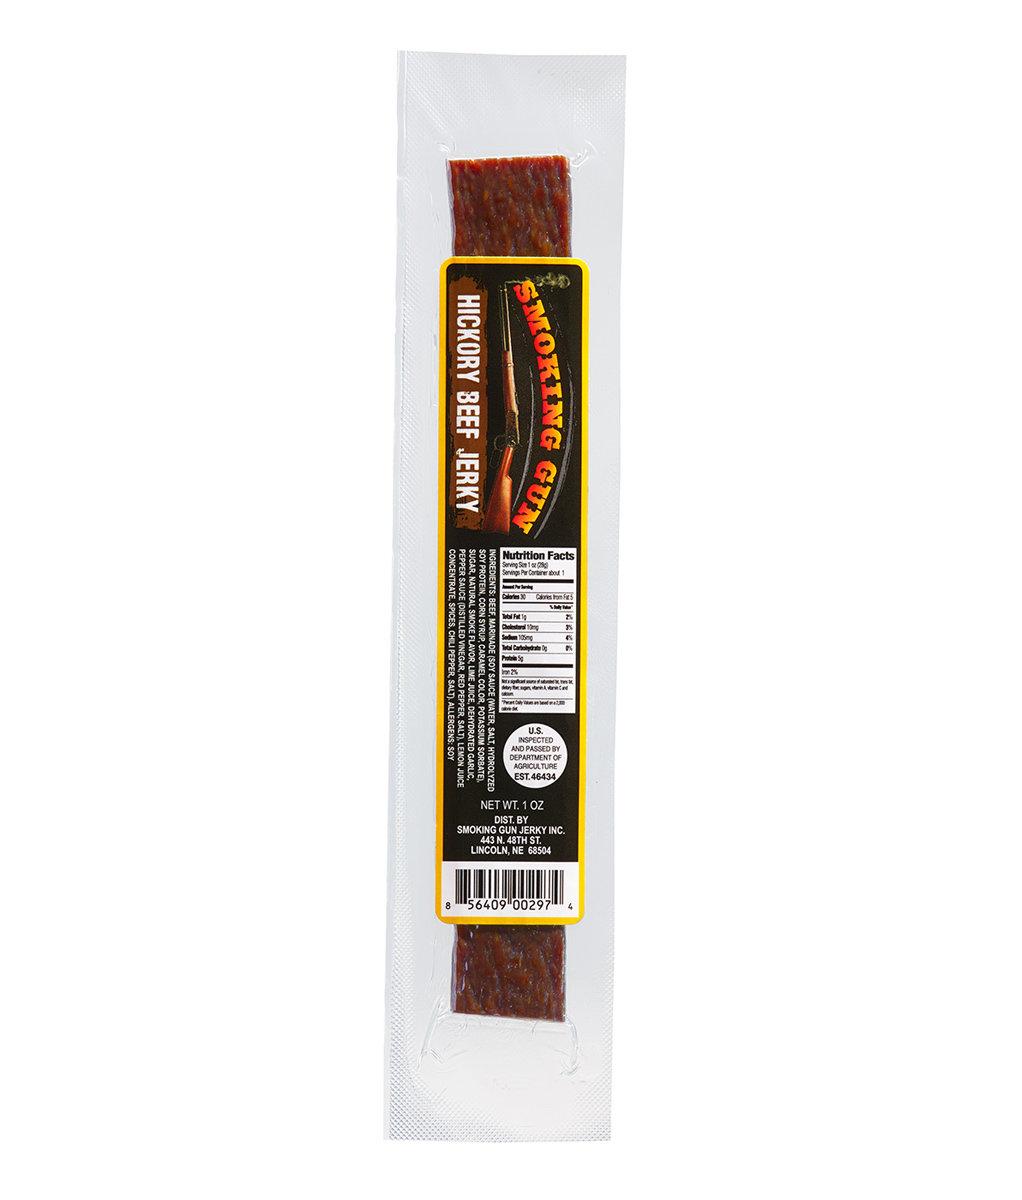 Hickory Beef Stick - ground meat, single 1oz. stick